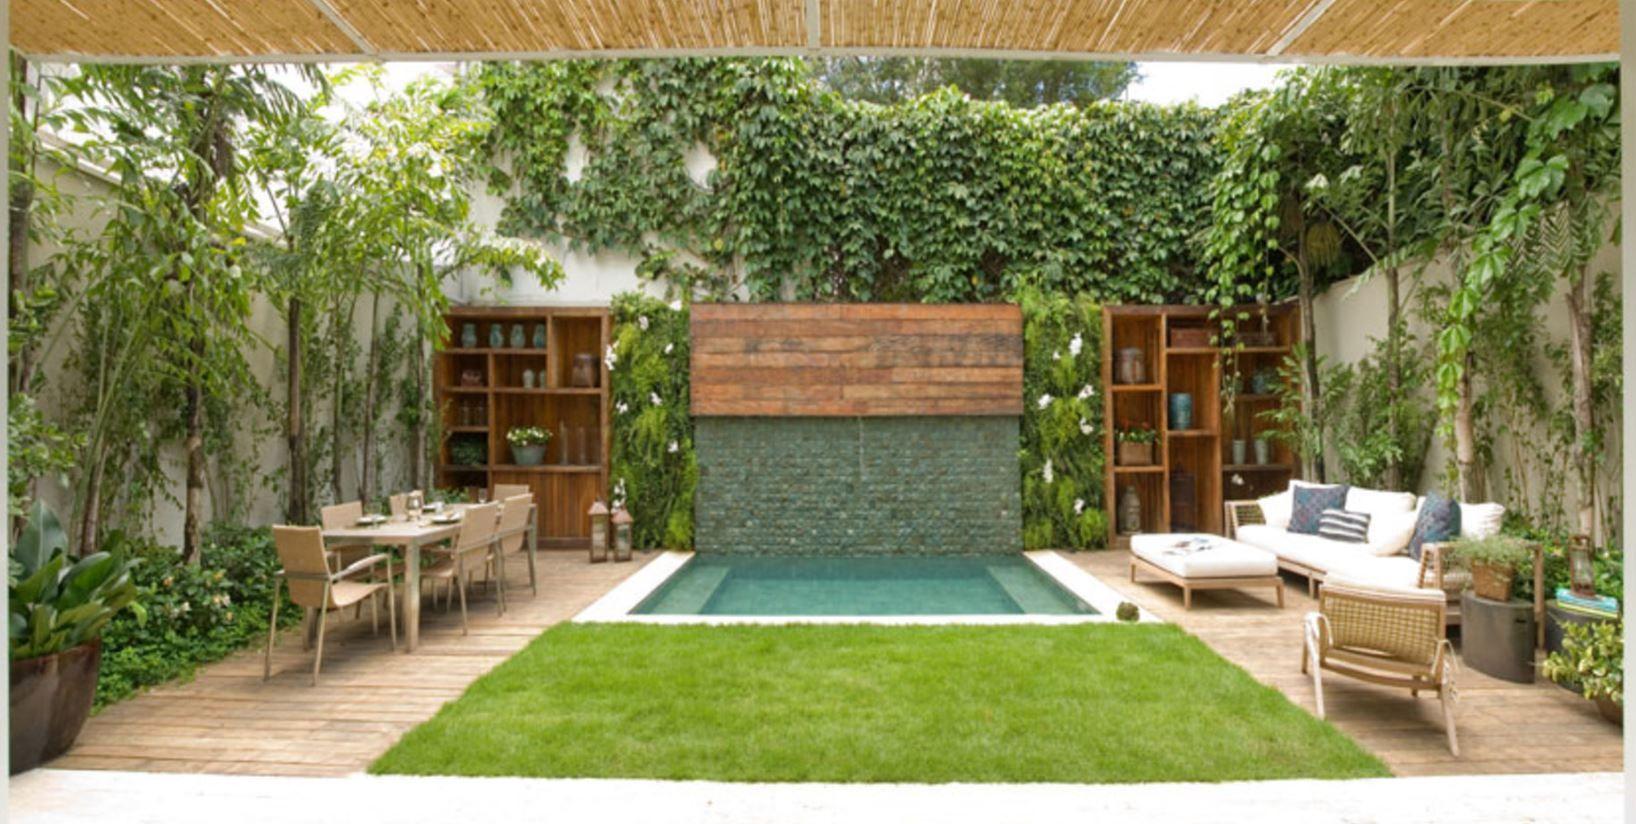 quintal piscina pequena